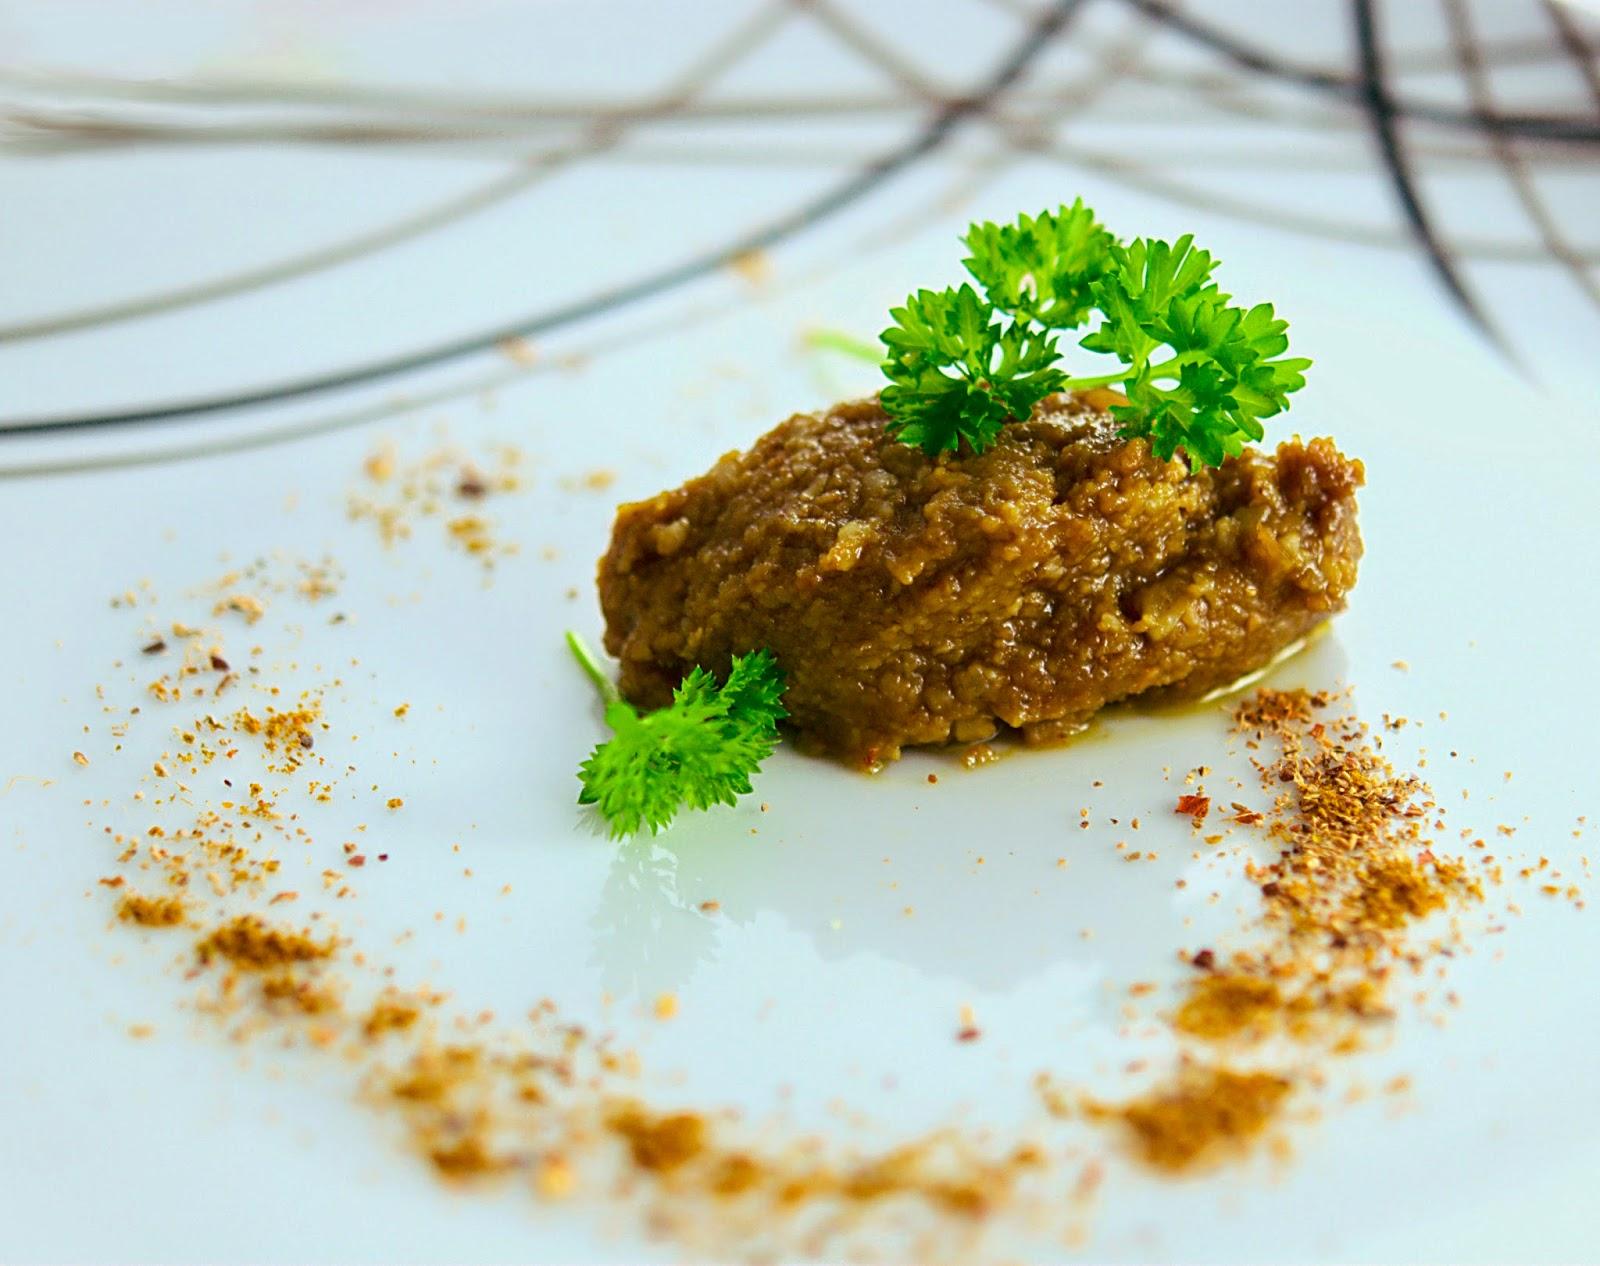 Mango-Curry pesto on a plate